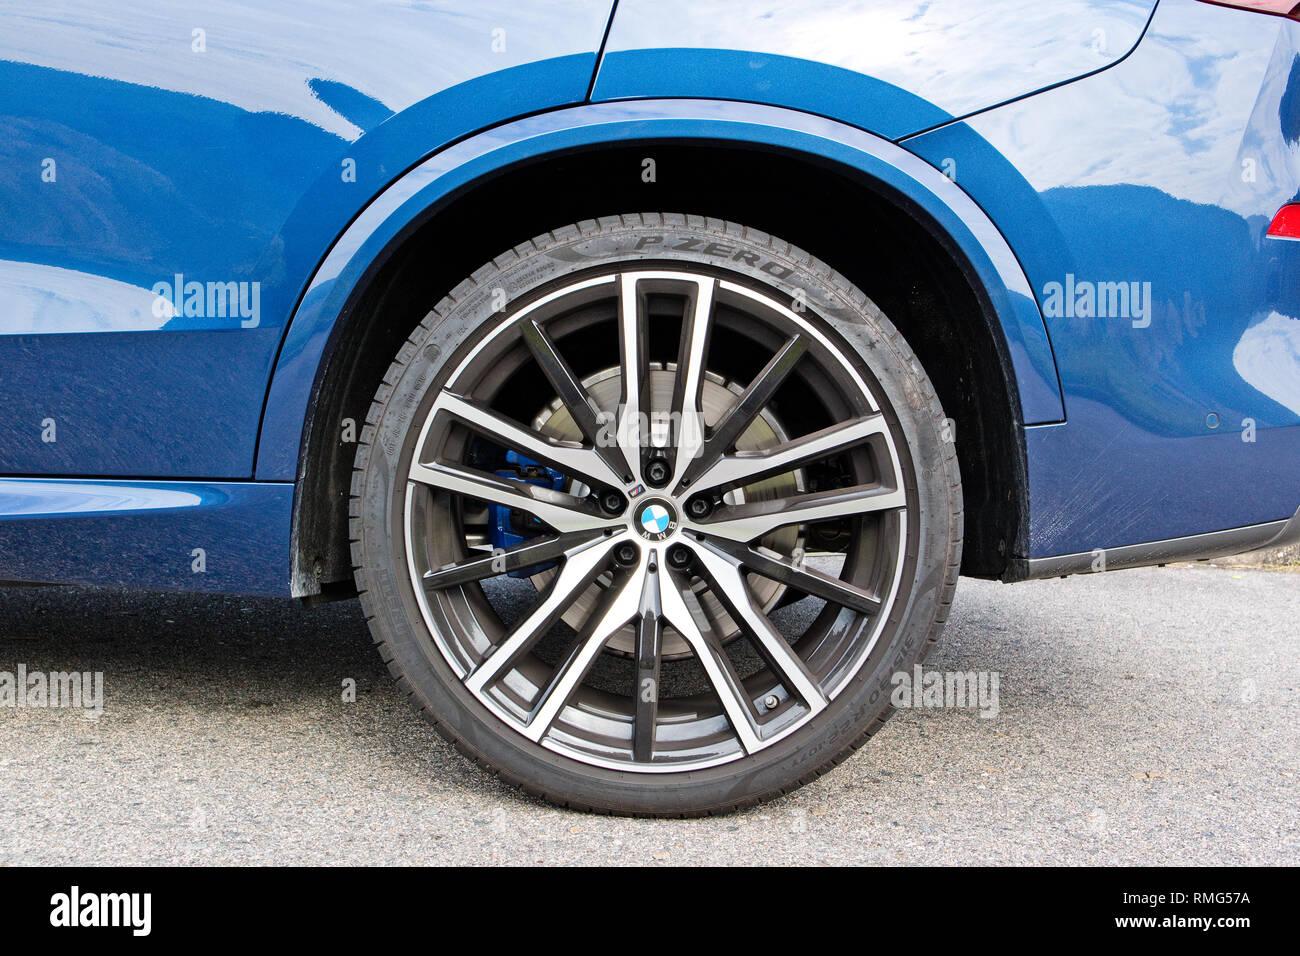 Hong Kong, China Dec 31, 2018 : BMW X5 2018 Wheel Dec 31 2018 in Hong Kong. - Stock Image